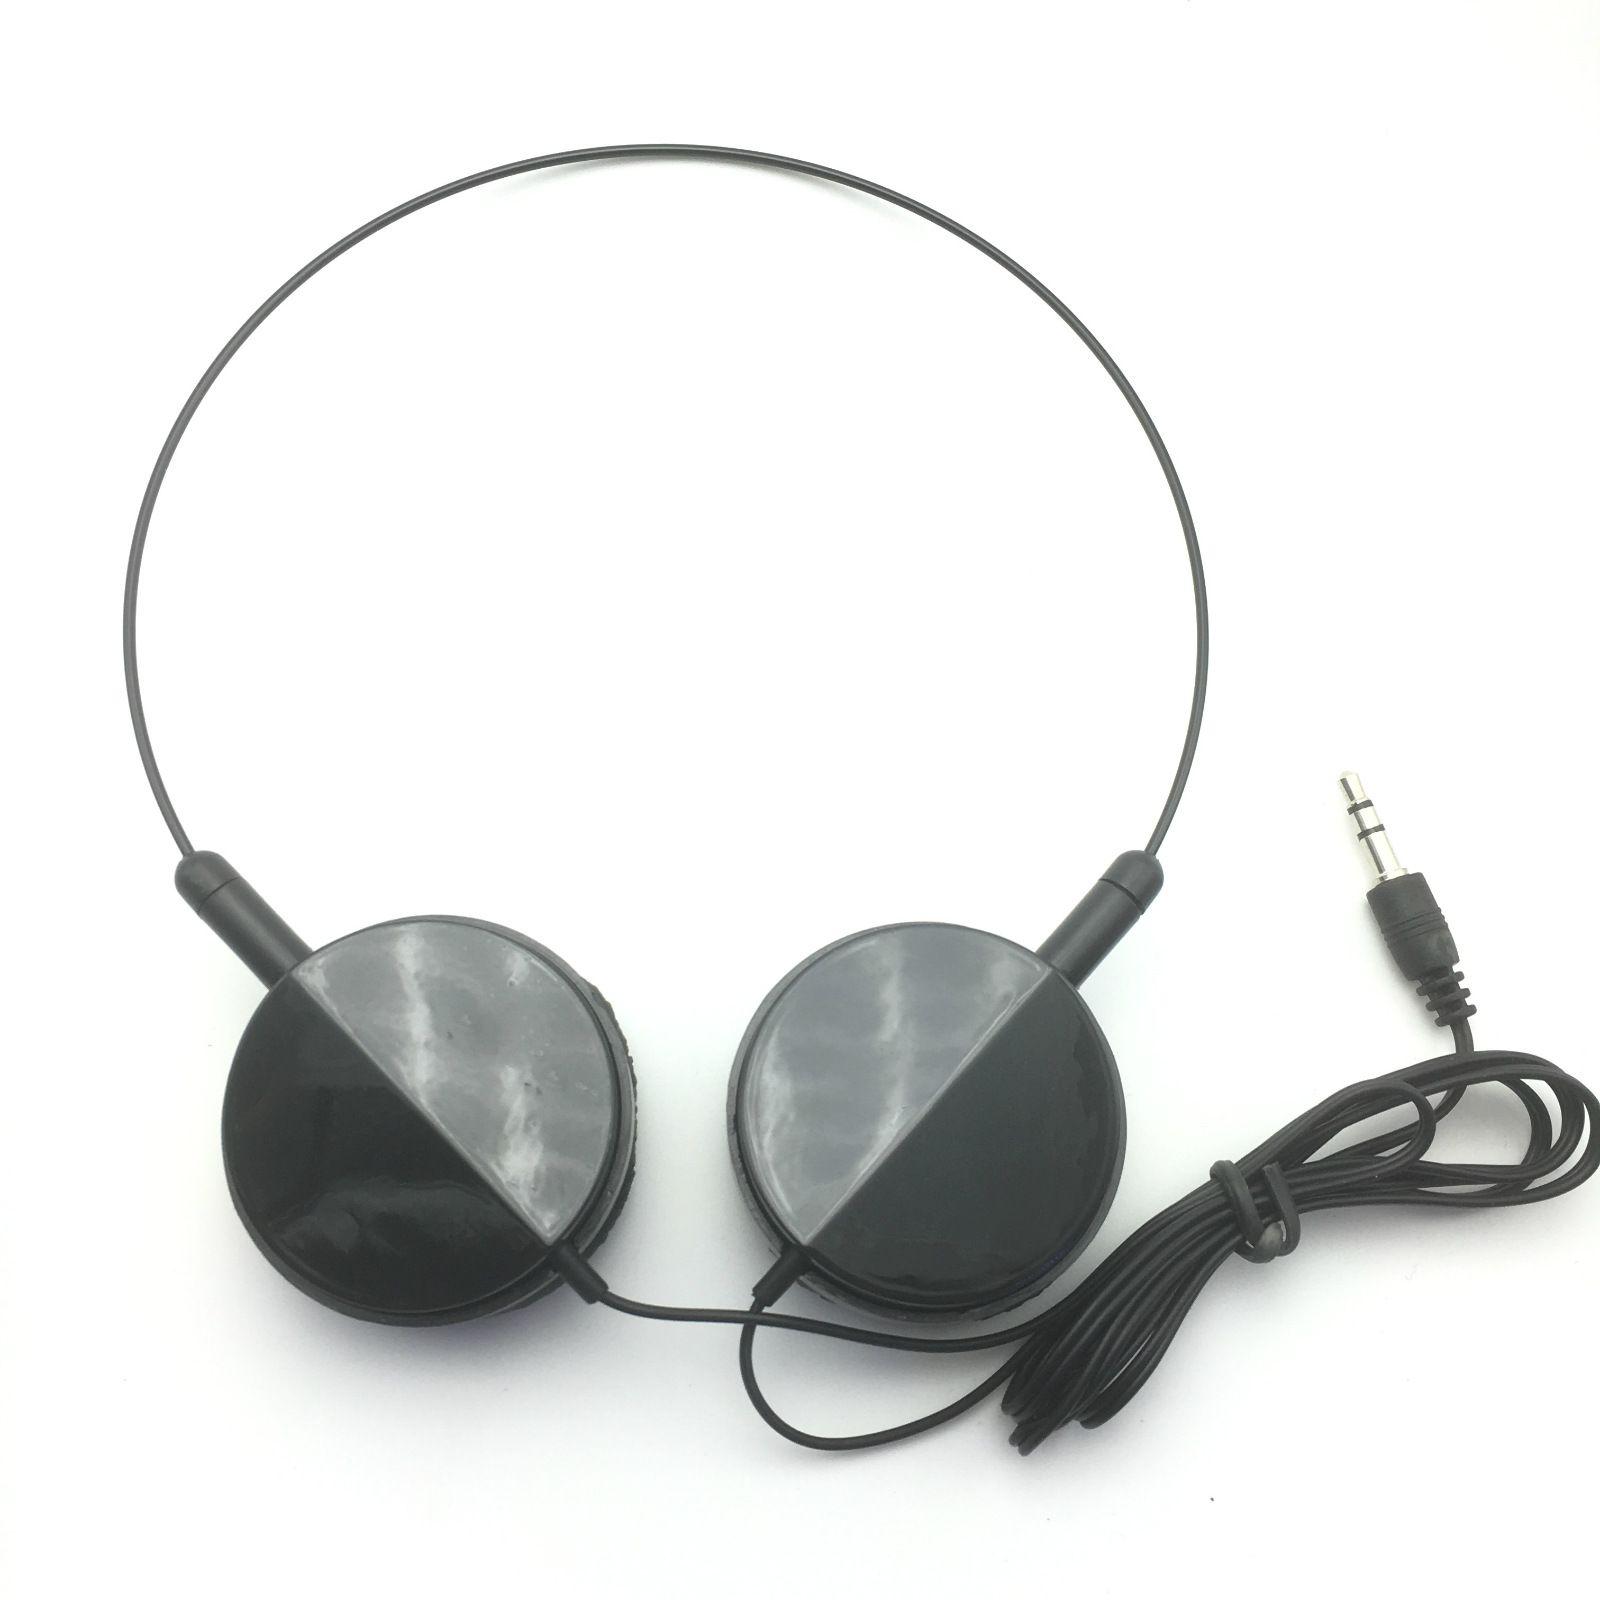 Hohe qualität geschenk kopfhörer Kopf band headset stereo kopfhörer ohne mikrofon